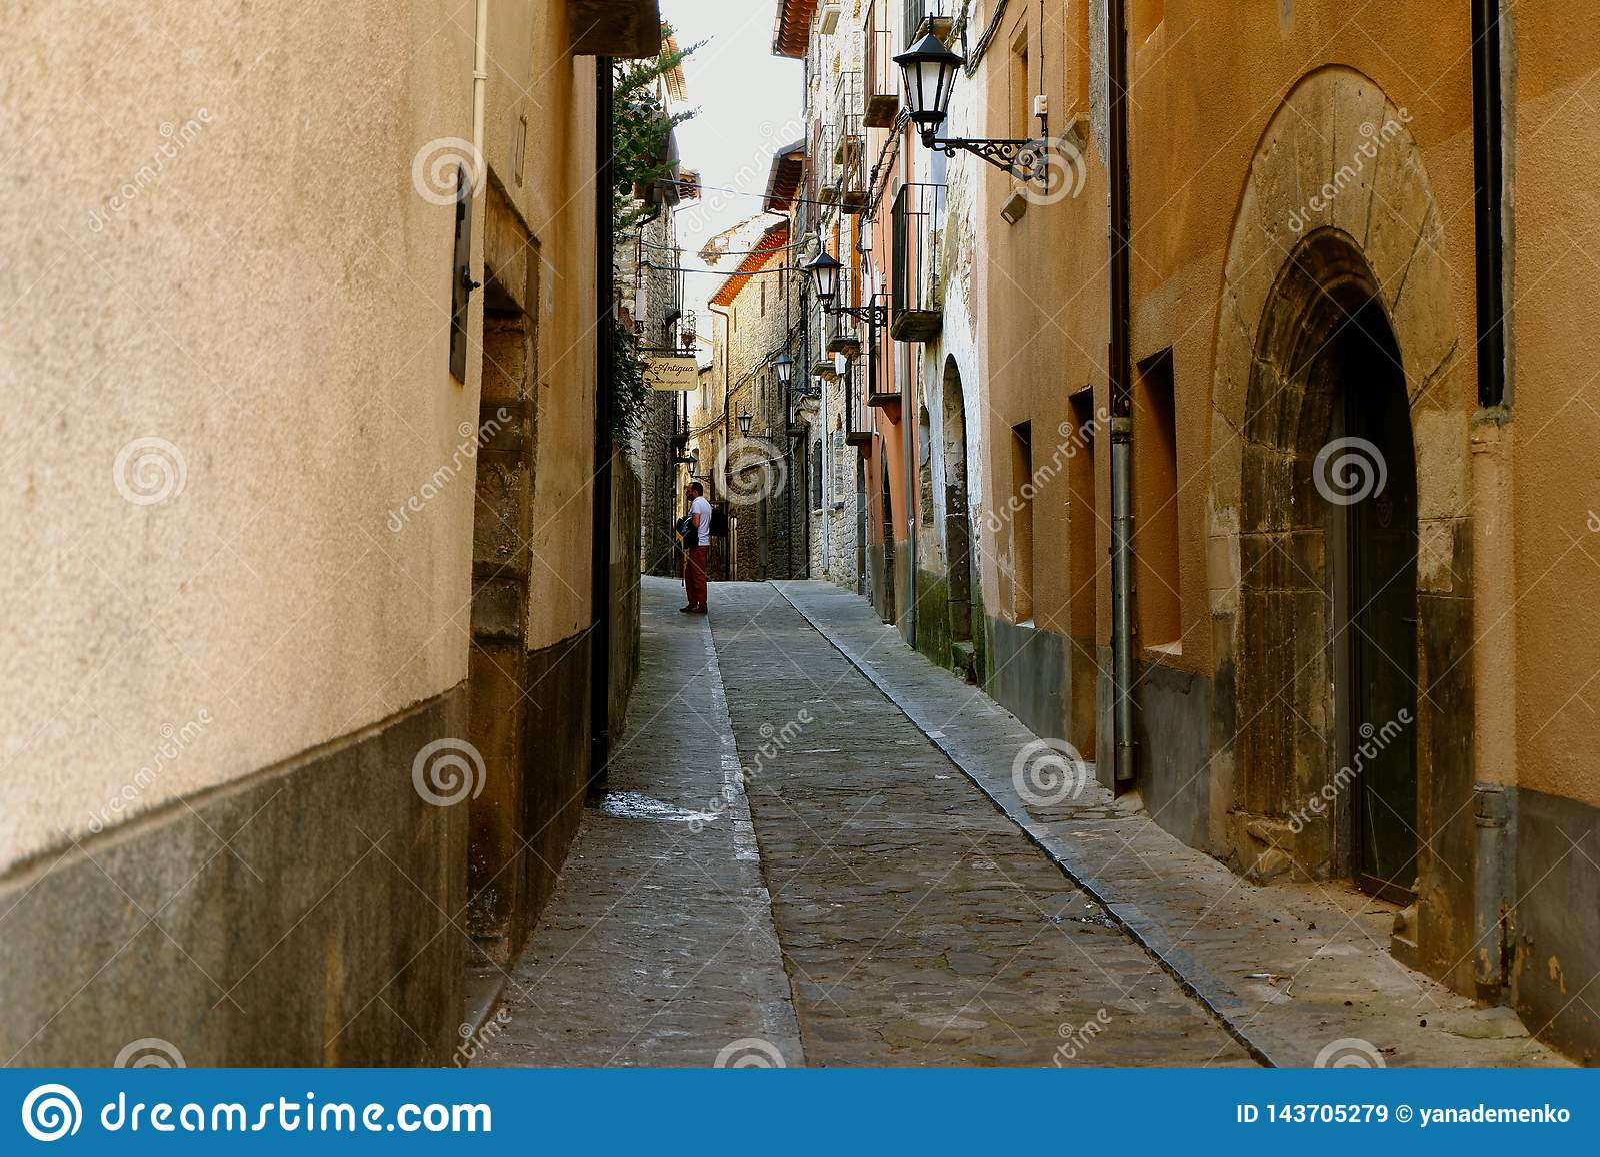 Narrow streets of Boltanya, spanish countryside